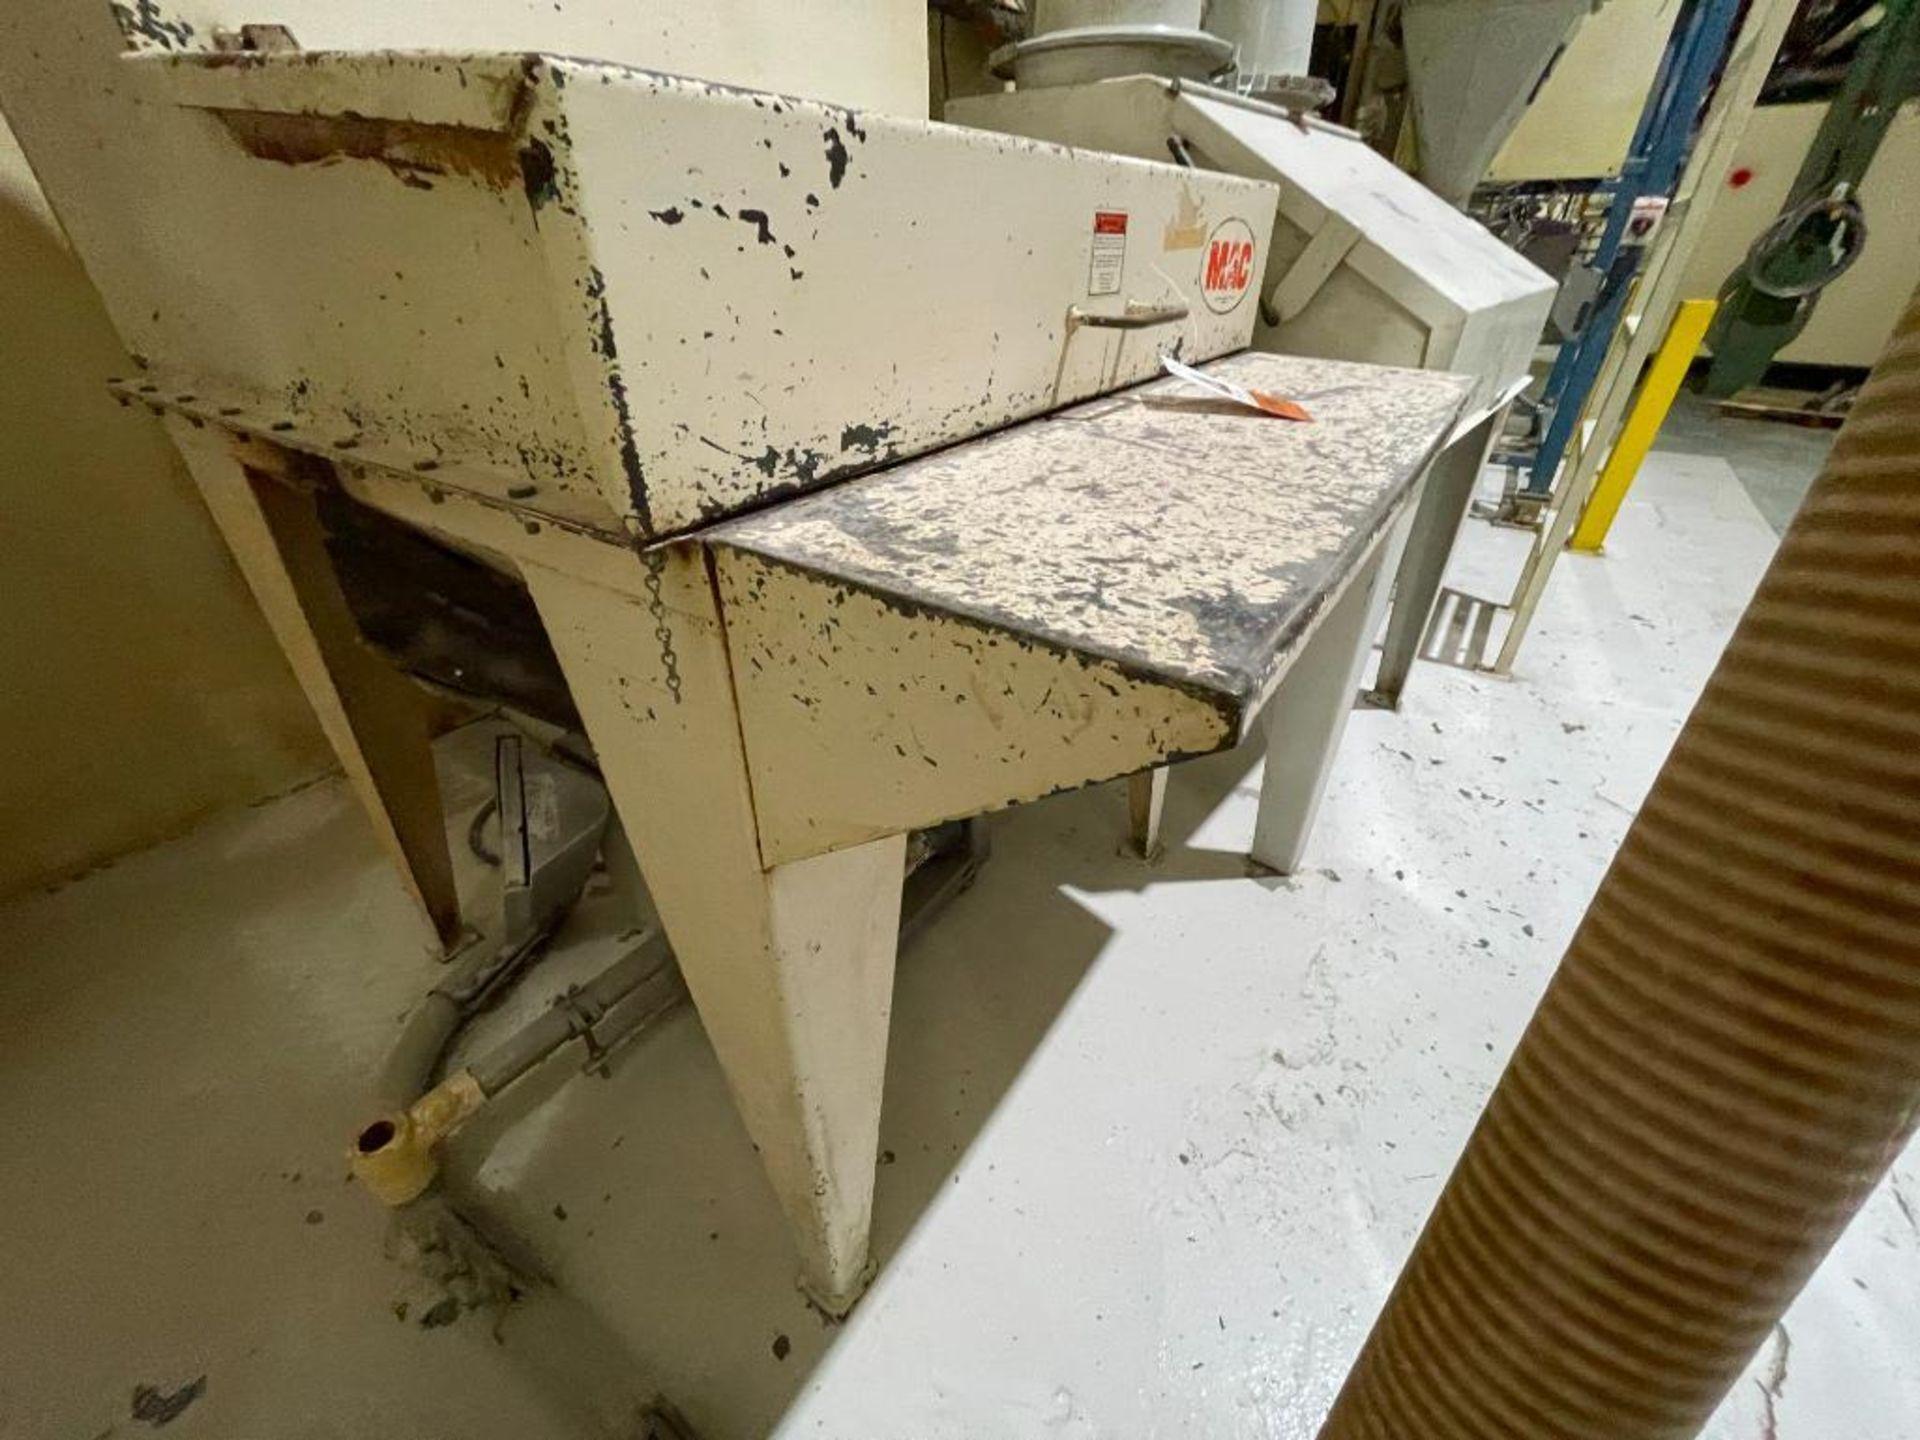 MAC dry ingredients dump station - Image 5 of 24